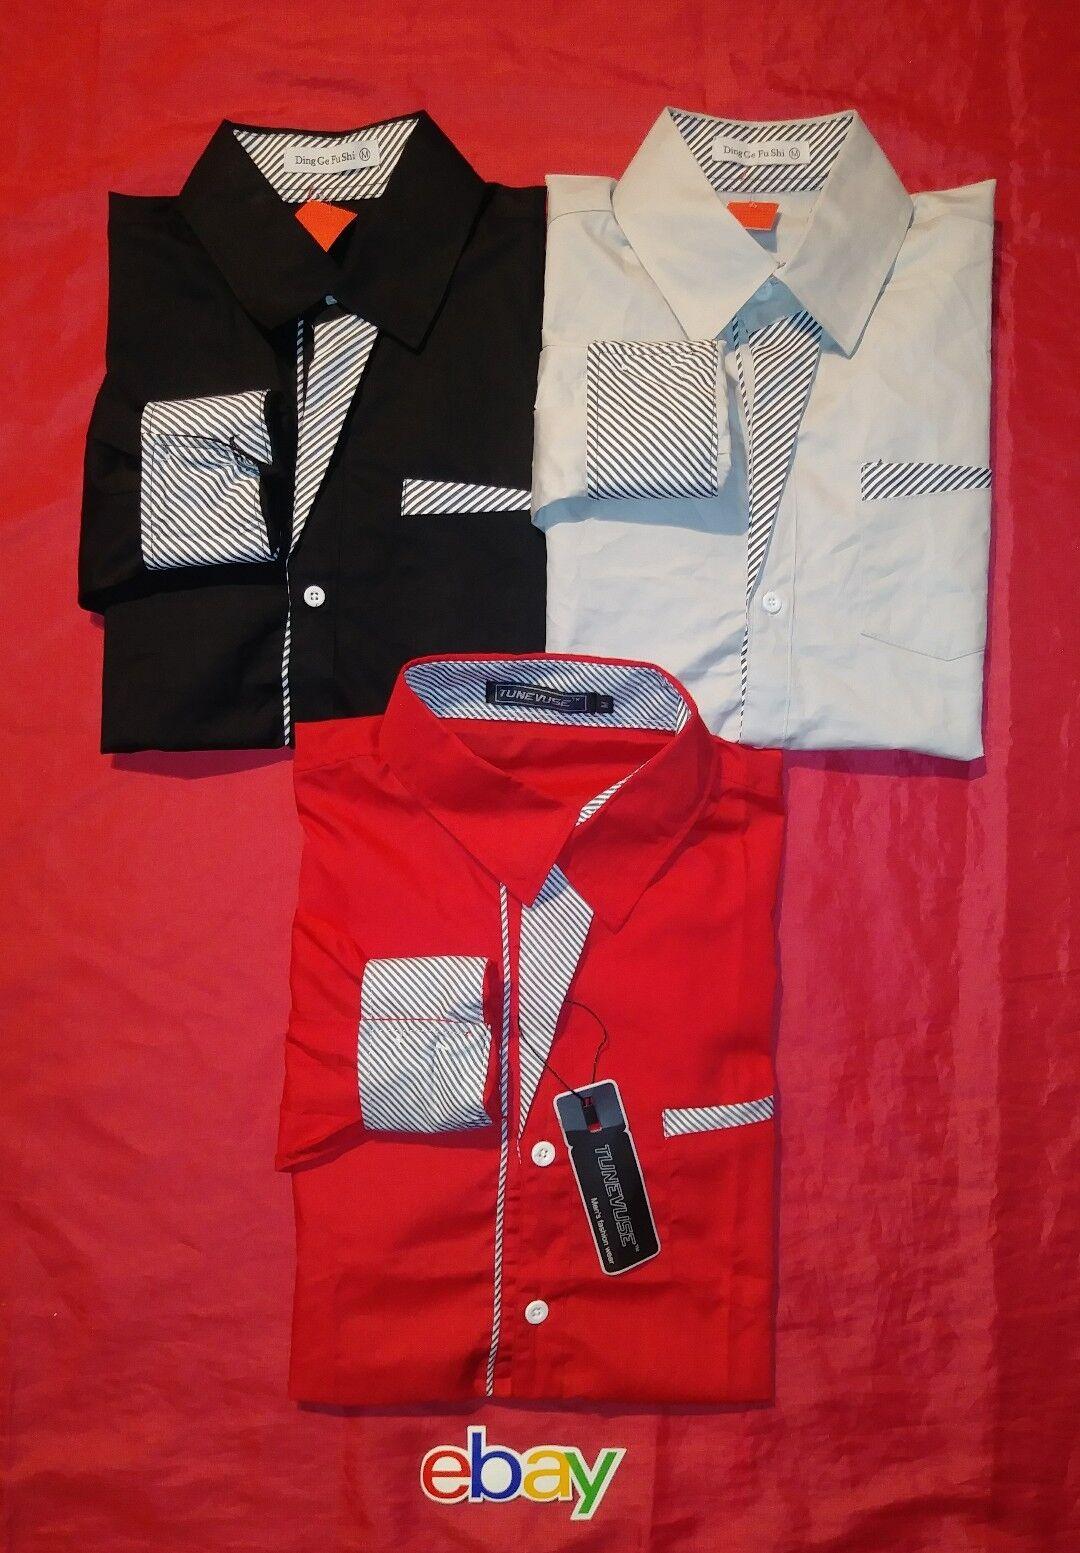 3 PC LOT Men DING GE FU SHI TUNEVUSE BUTTON UP Shirts Korean SZ M EXTRA Slim Fit